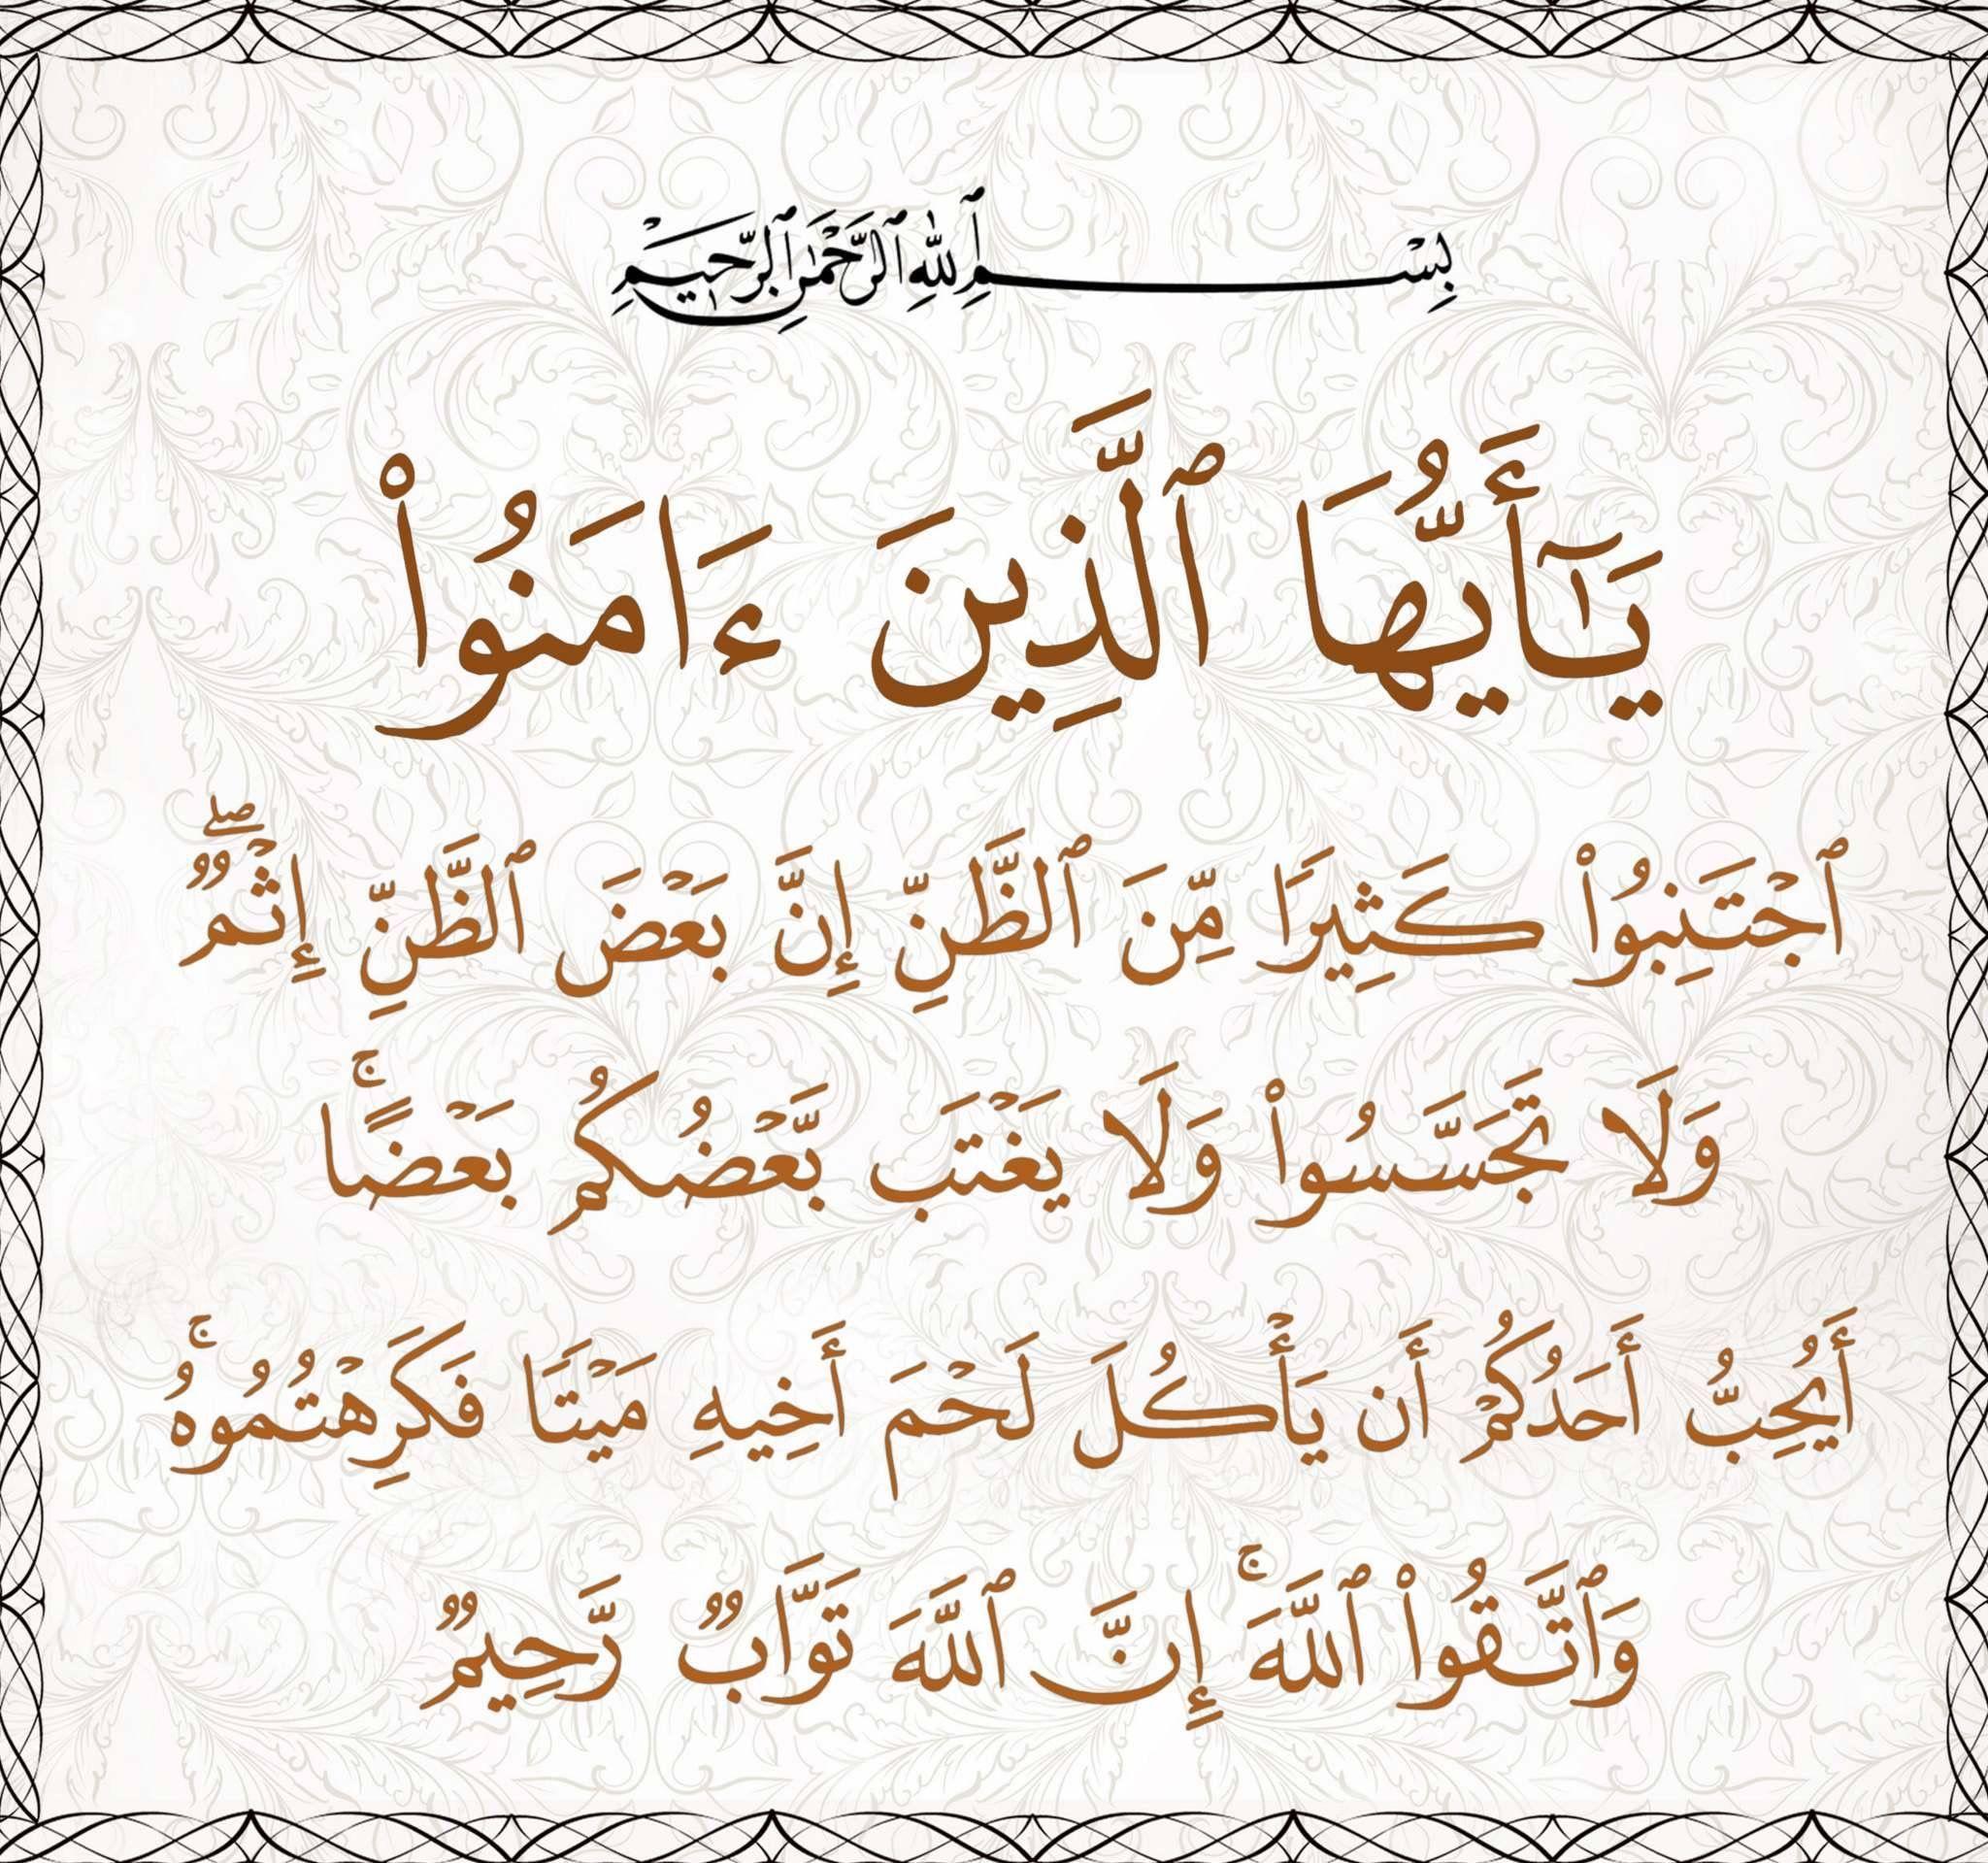 ١٢ الحجرات Arabic Calligraphy Calligraphy Arabic